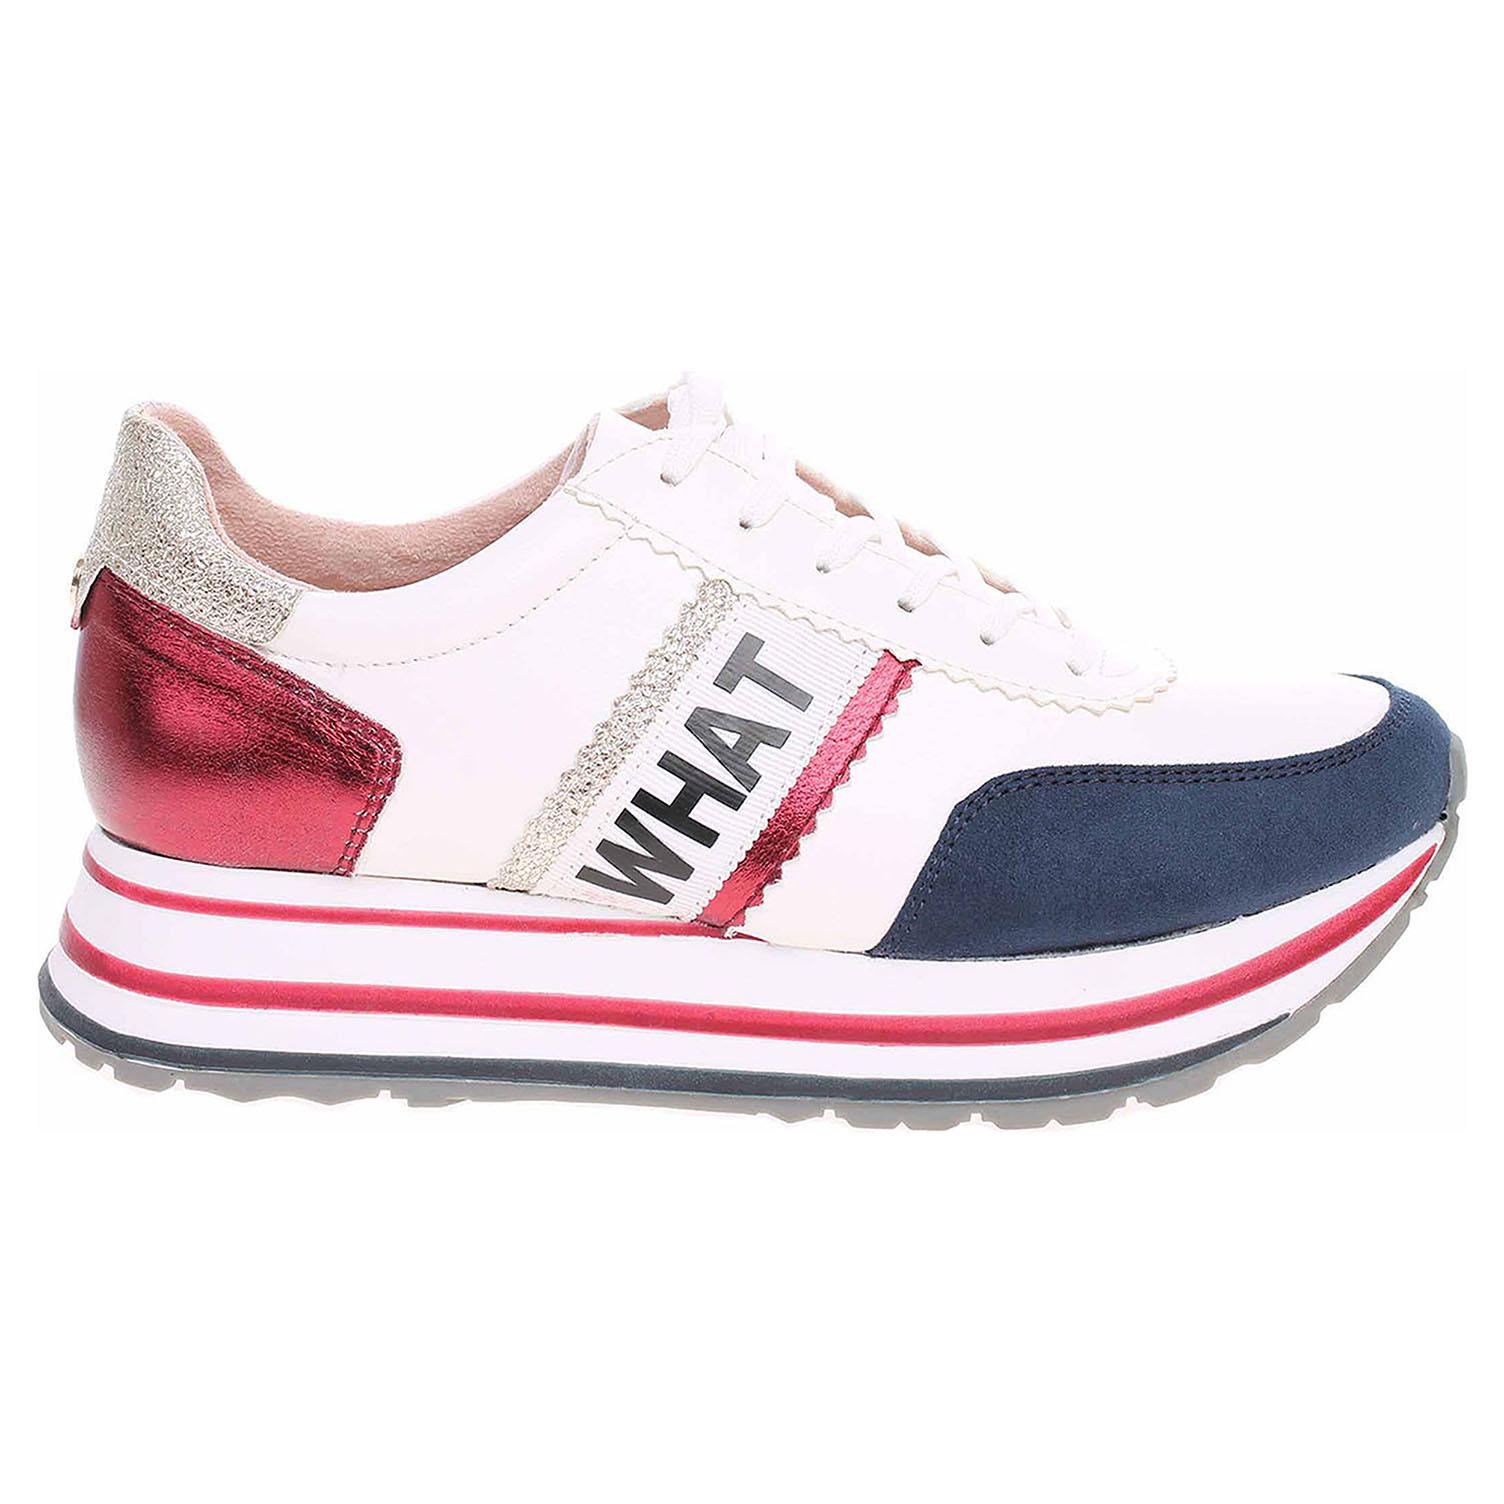 37e5ca3a264 Ecco Tamaris dámská obuv 1-23737-22 white comb 23100693